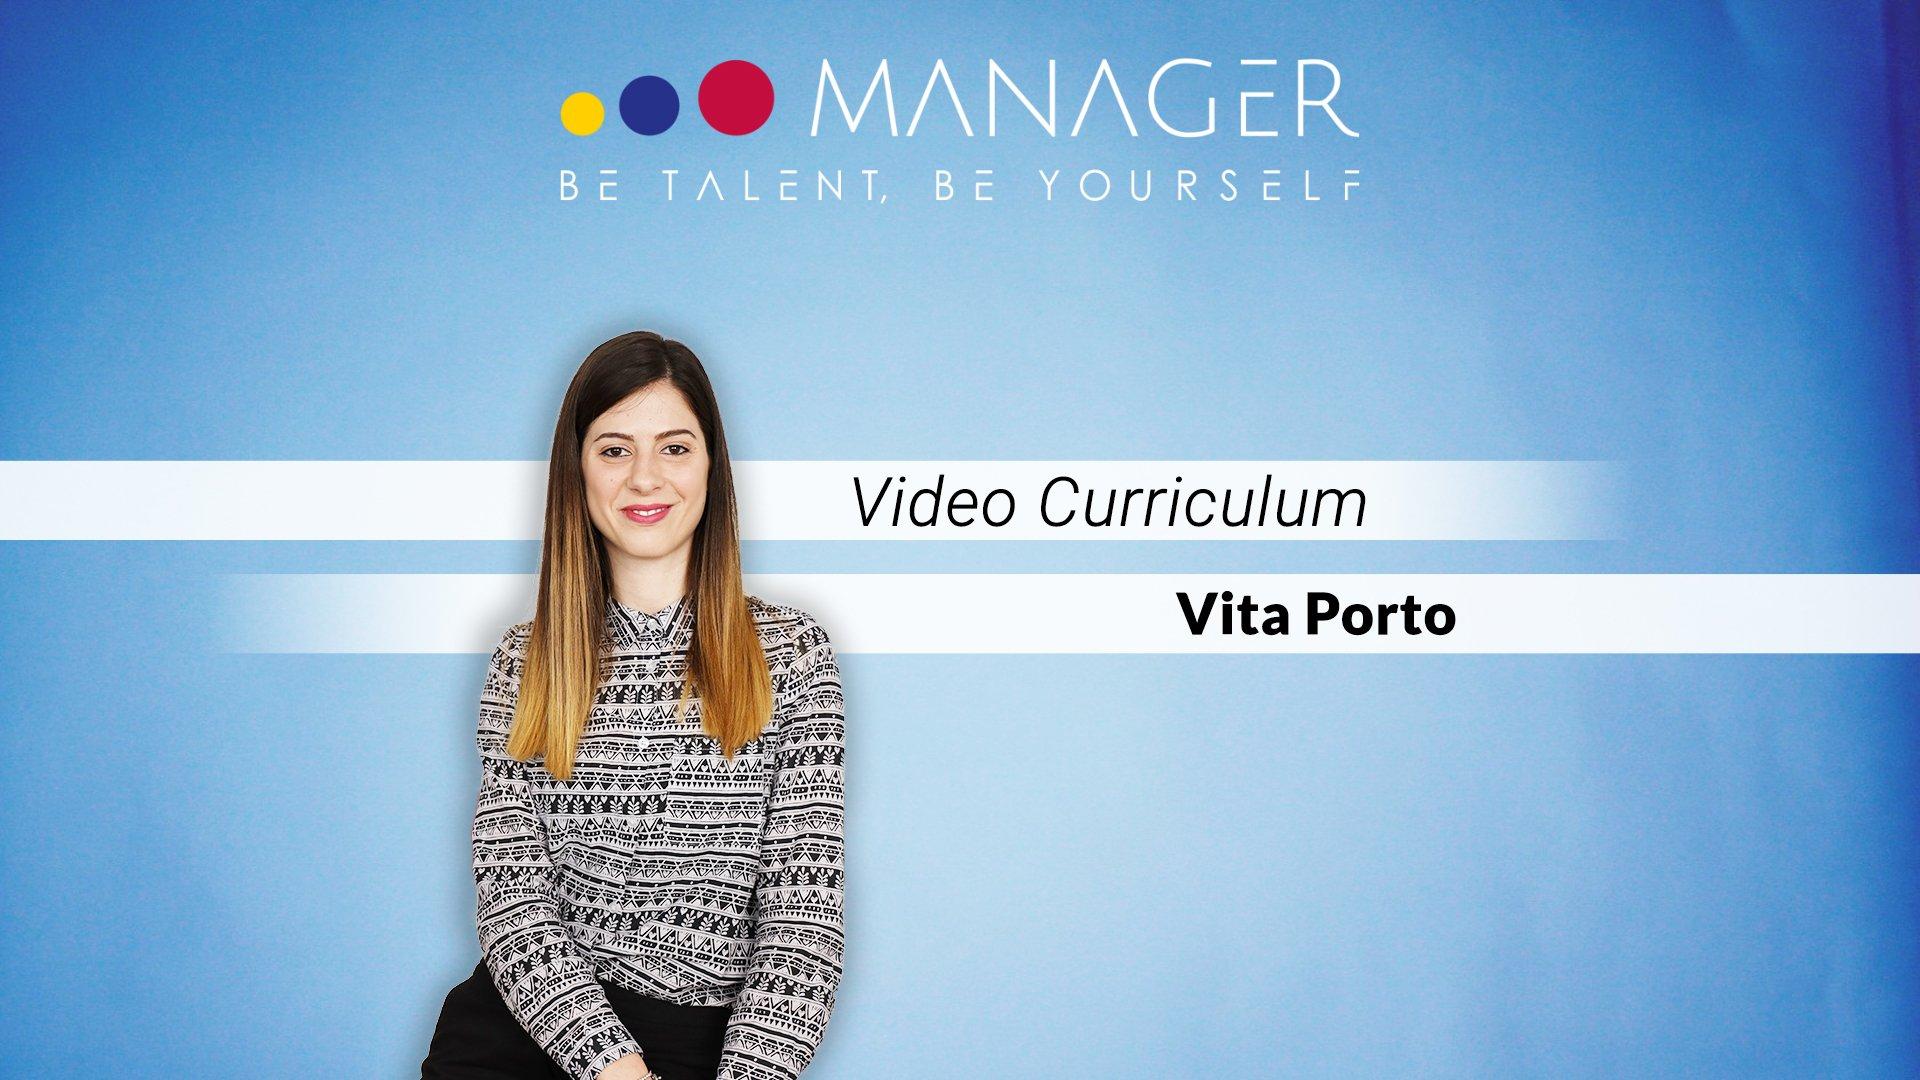 Vita Porto